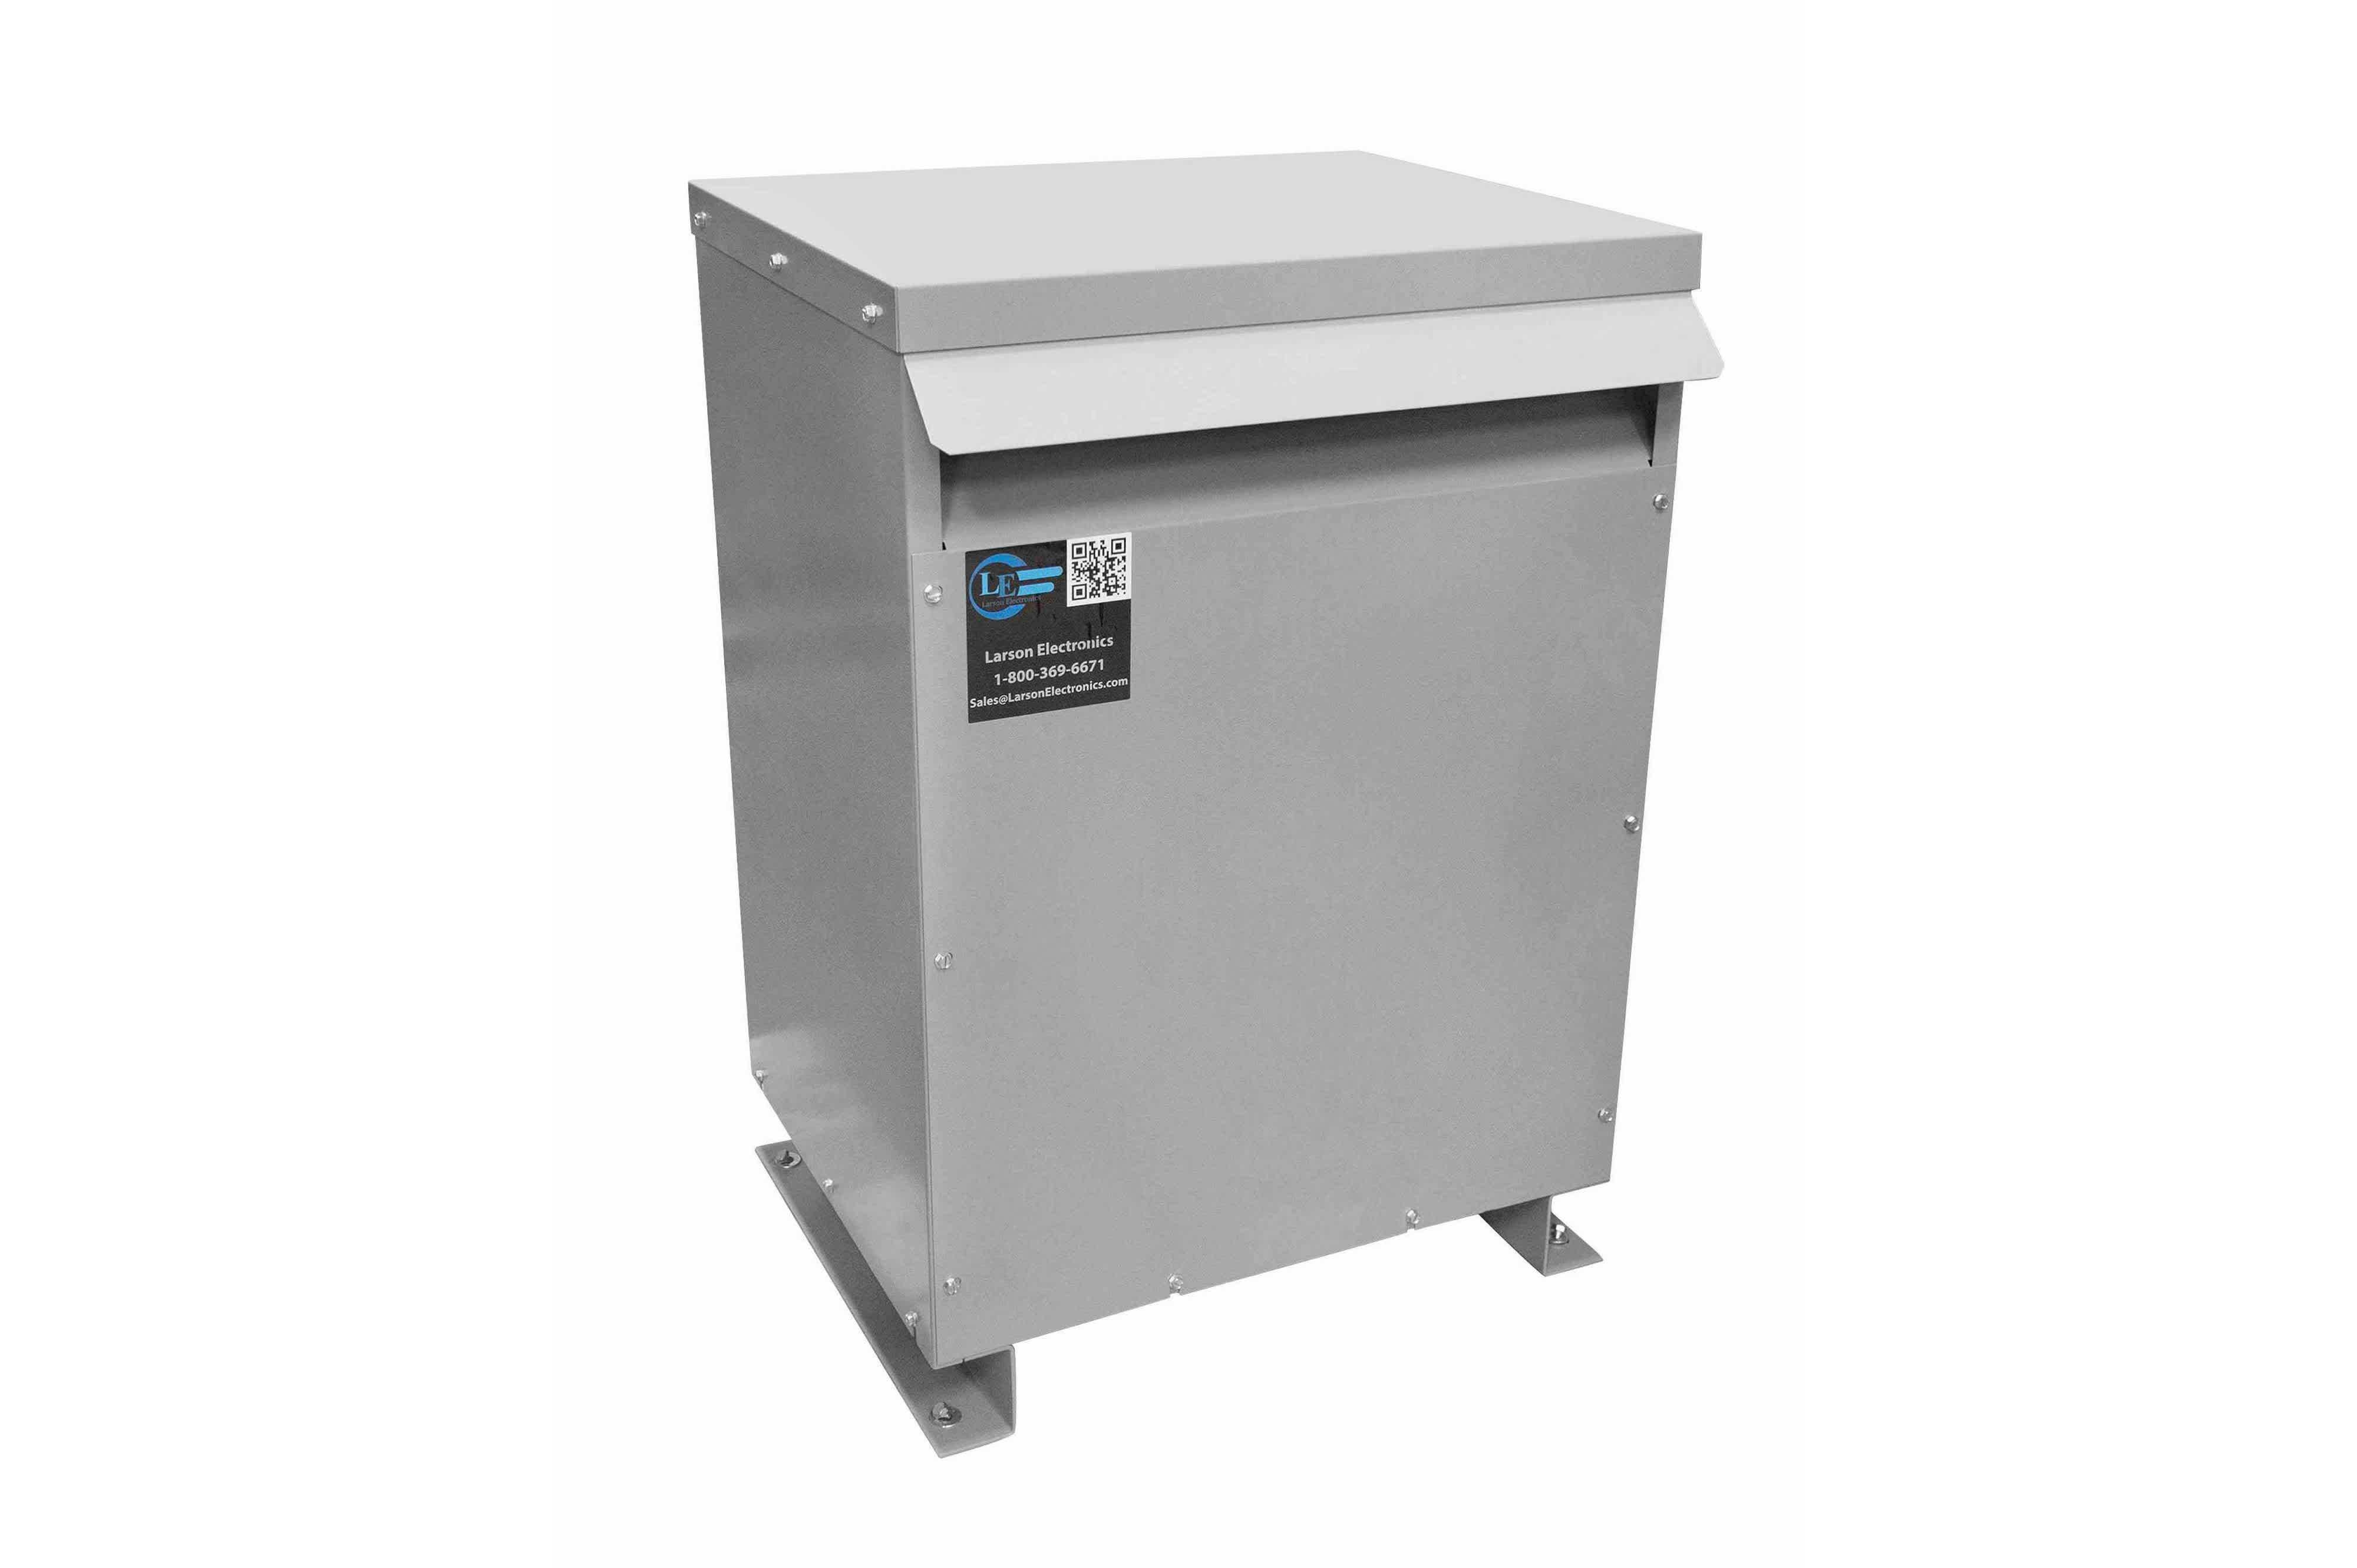 13 kVA 3PH Isolation Transformer, 575V Wye Primary, 380V Delta Secondary, N3R, Ventilated, 60 Hz